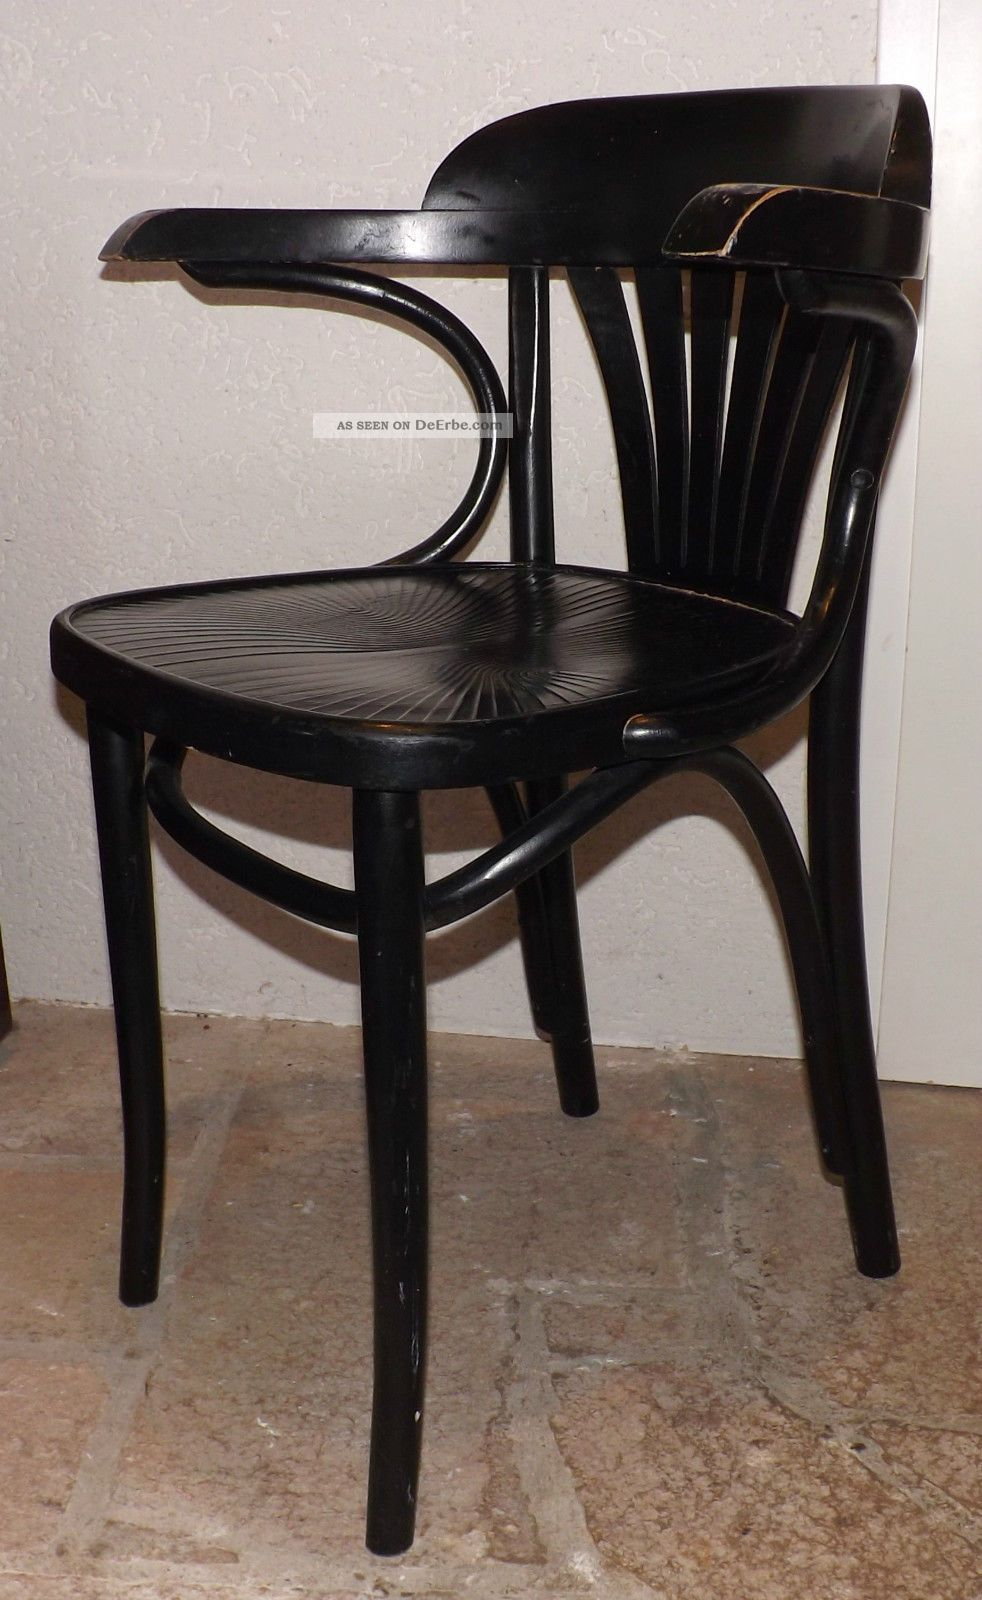 Kaffeehaus stuhl finest thonet with kaffeehaus stuhl for Thonet stuhl schwarz